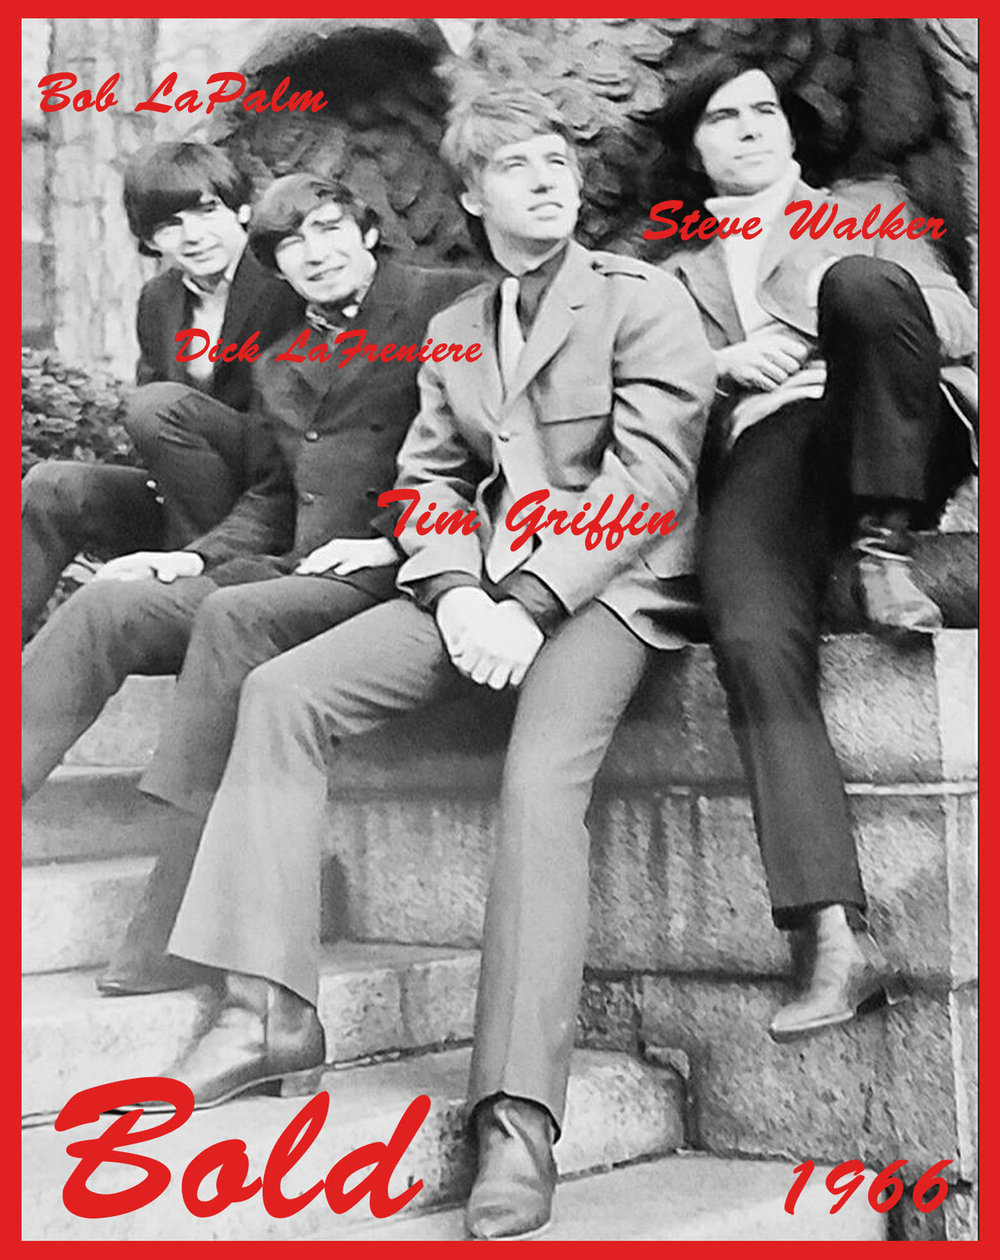 BOLD-1966.jpg